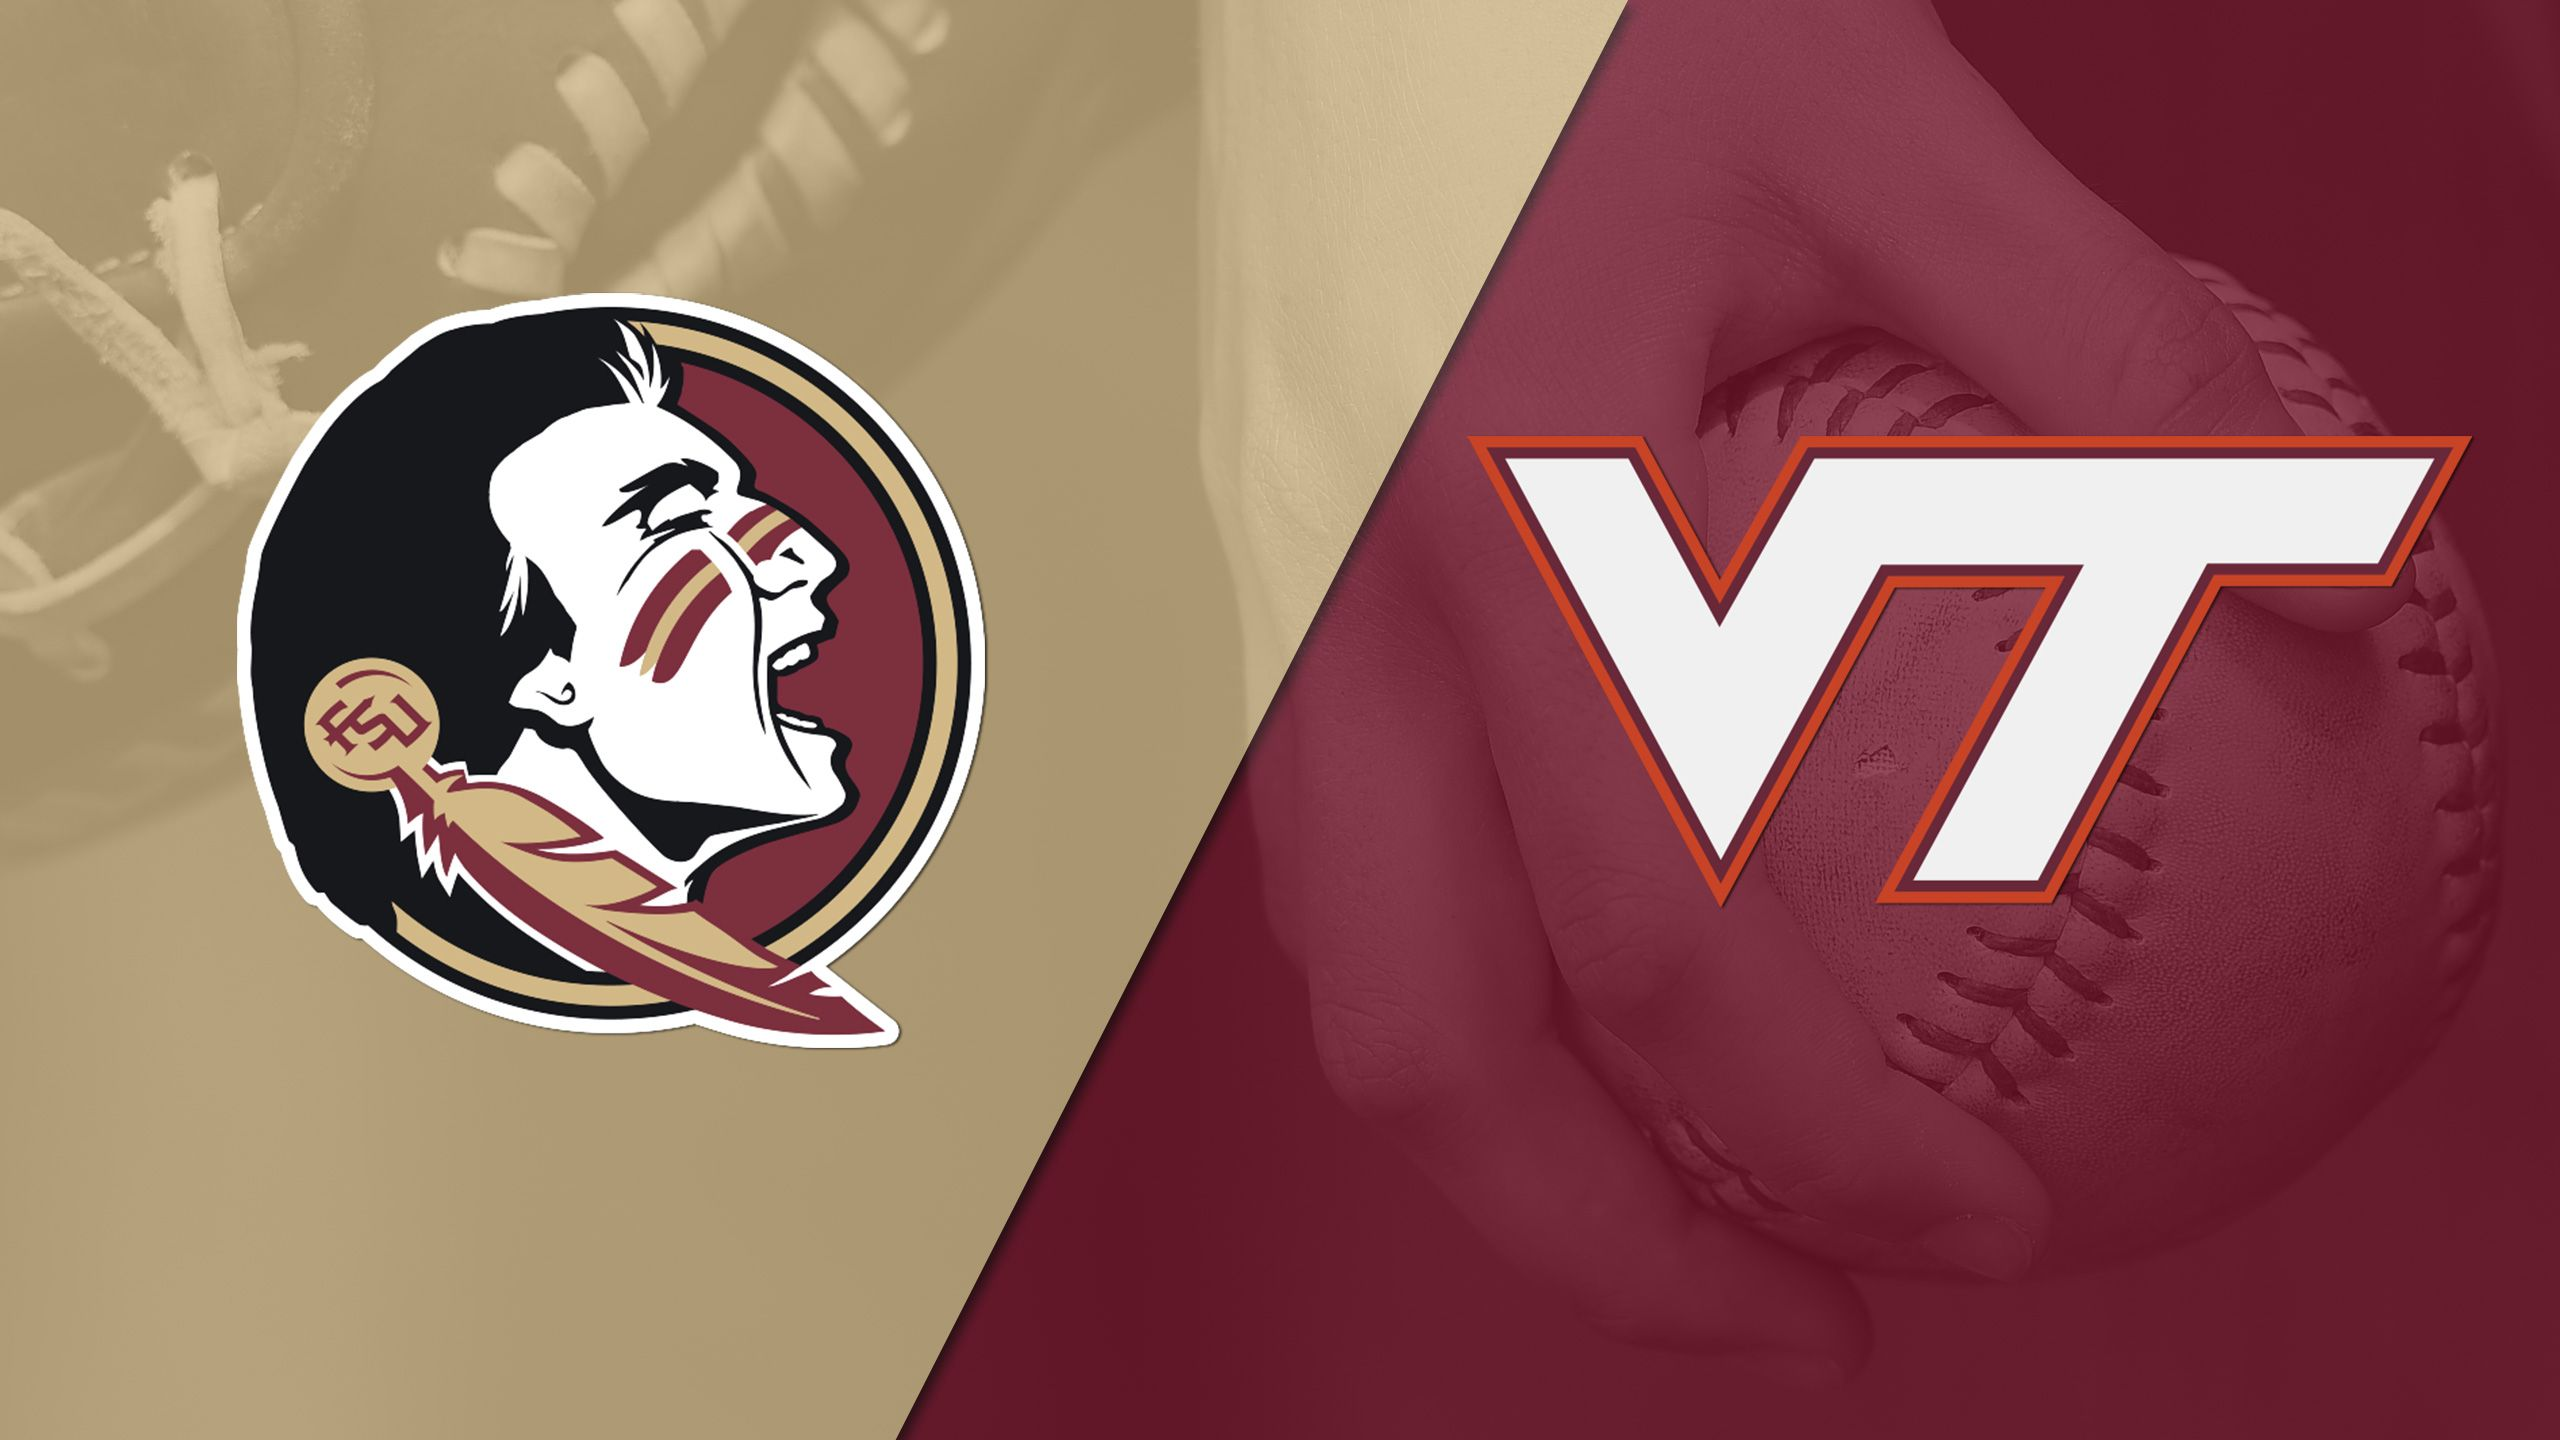 #2 Florida State vs. Virginia Tech (Softball)